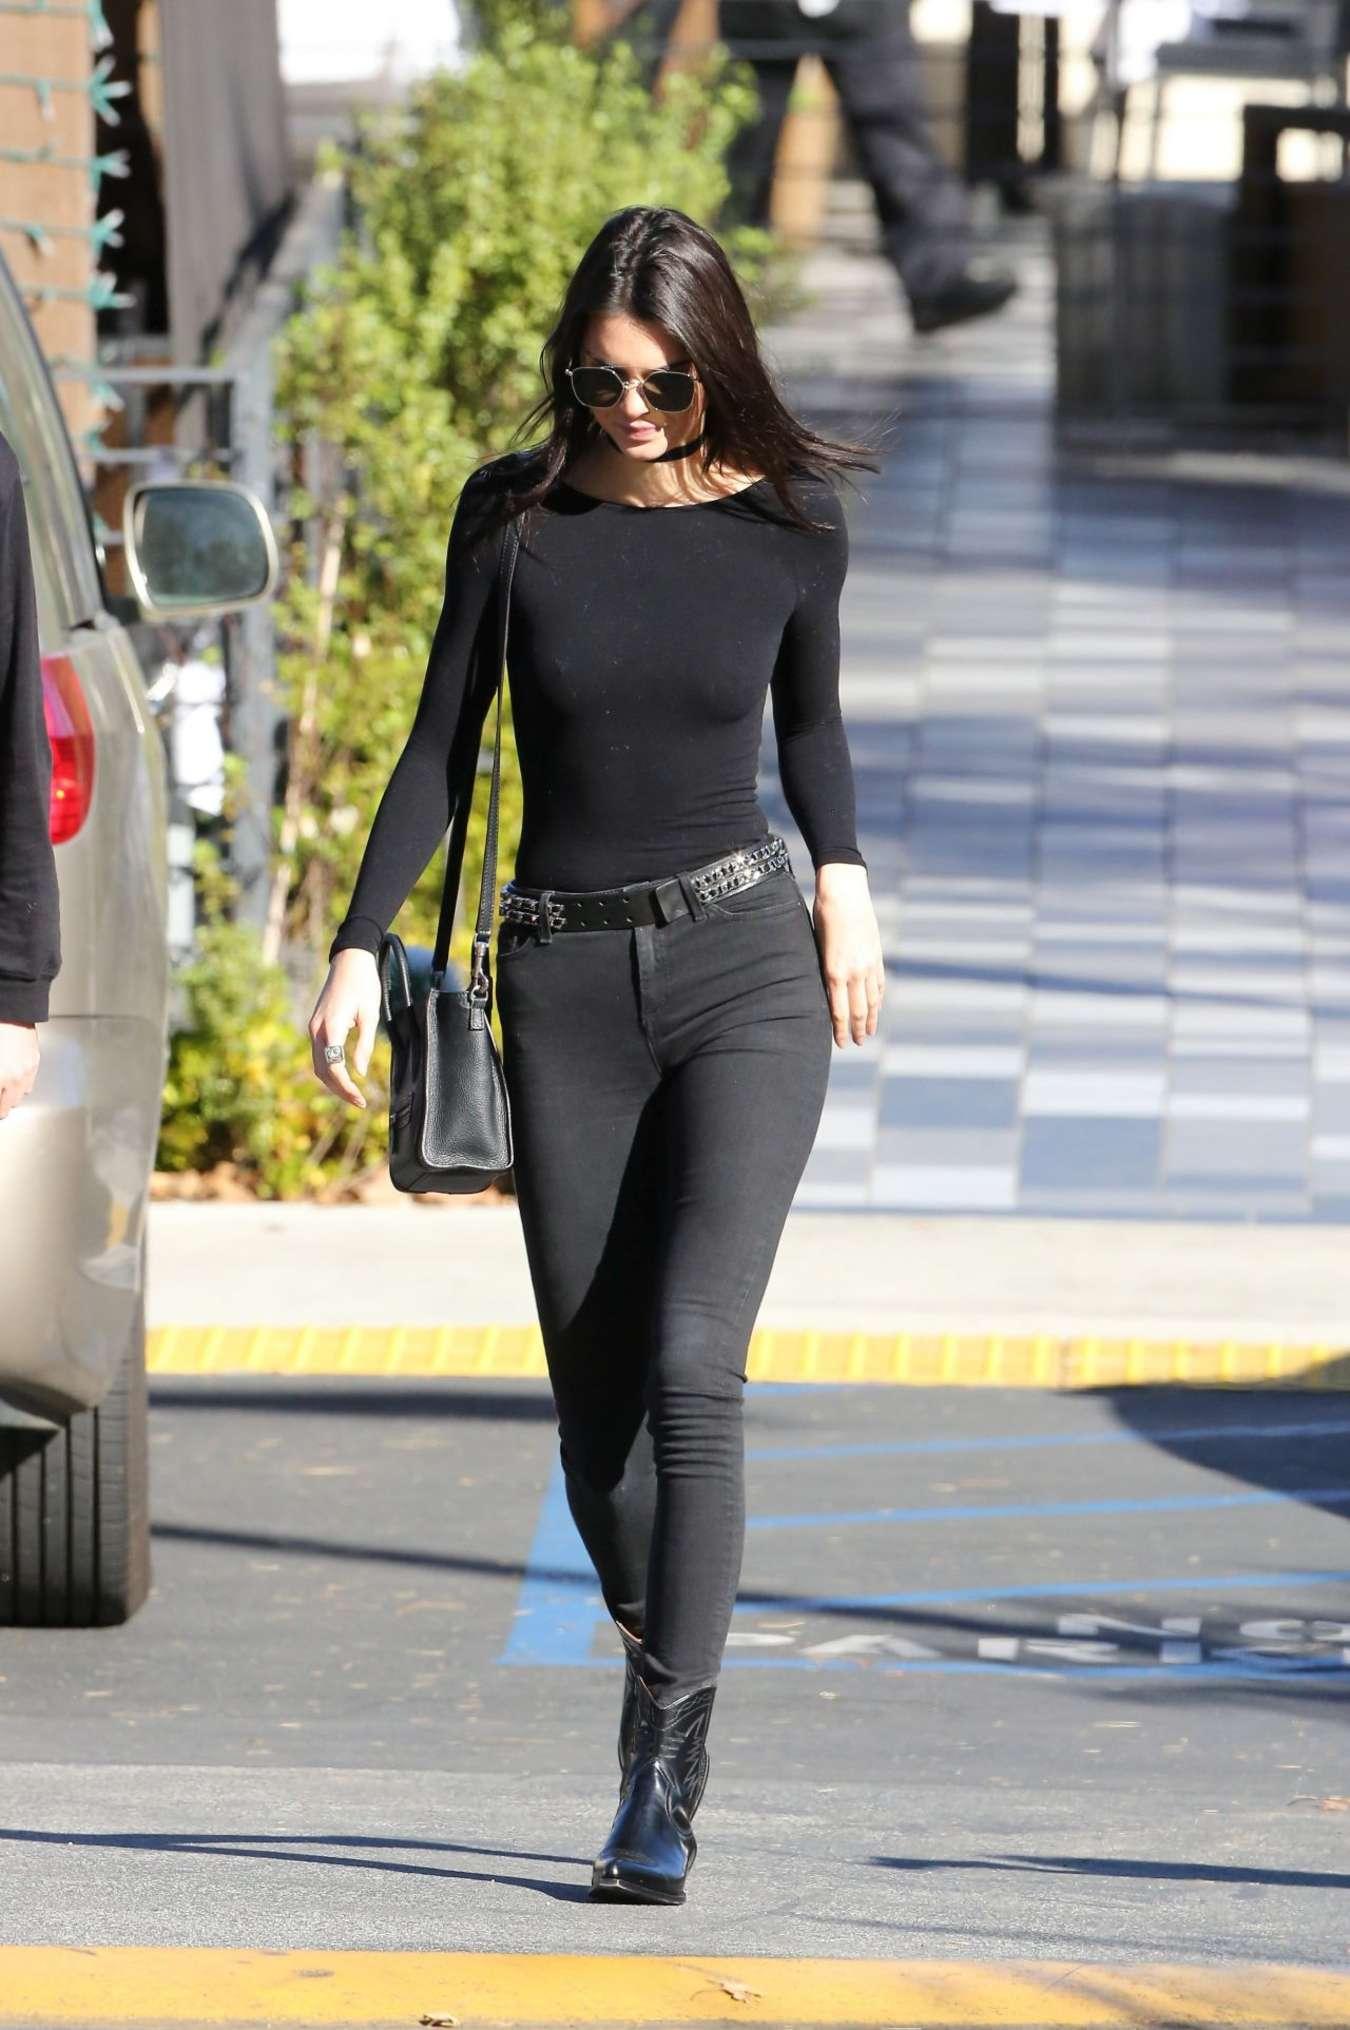 Selena gomez sexy ass moves - 2 part 2